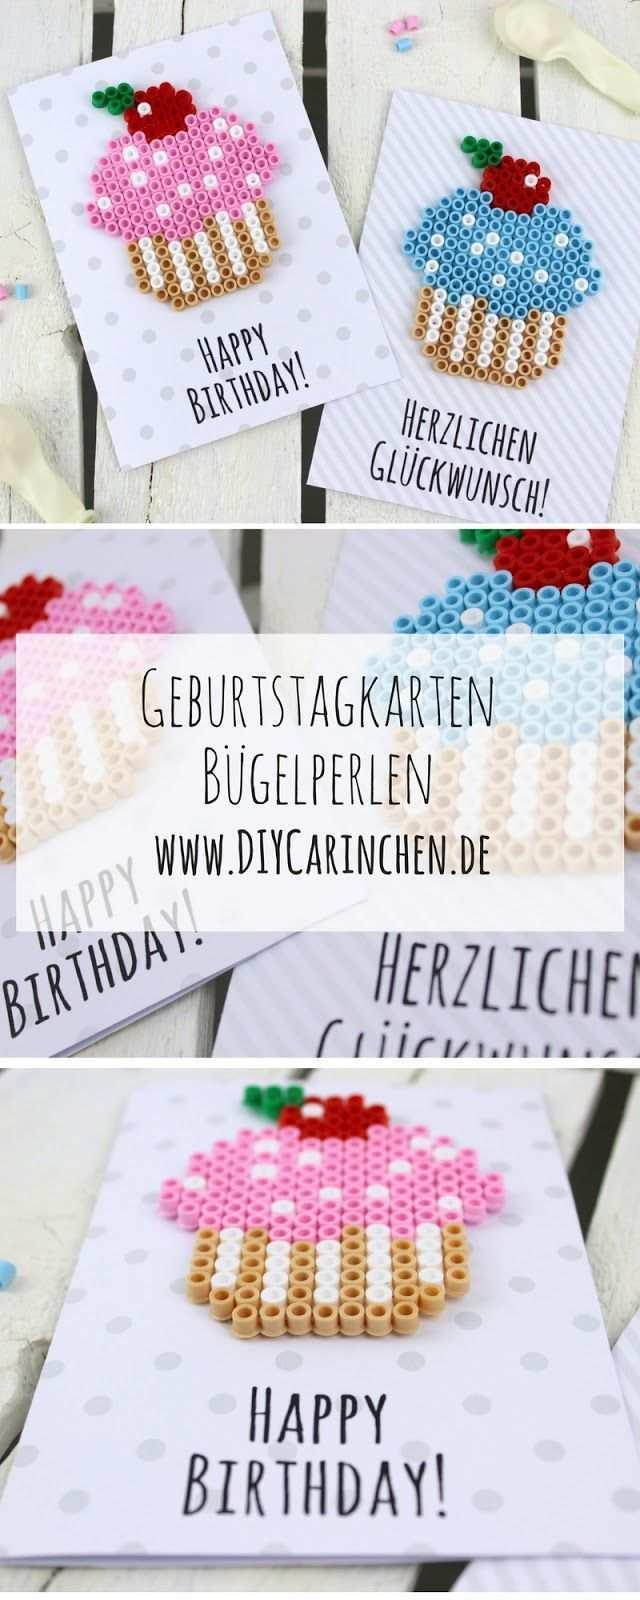 Diy Geburtstagkarten Aus Bugelperlen Selber Machen Geschenkidee Geburtstagskarten Selber Machen Geschenkideen Geschenke Selber Machen